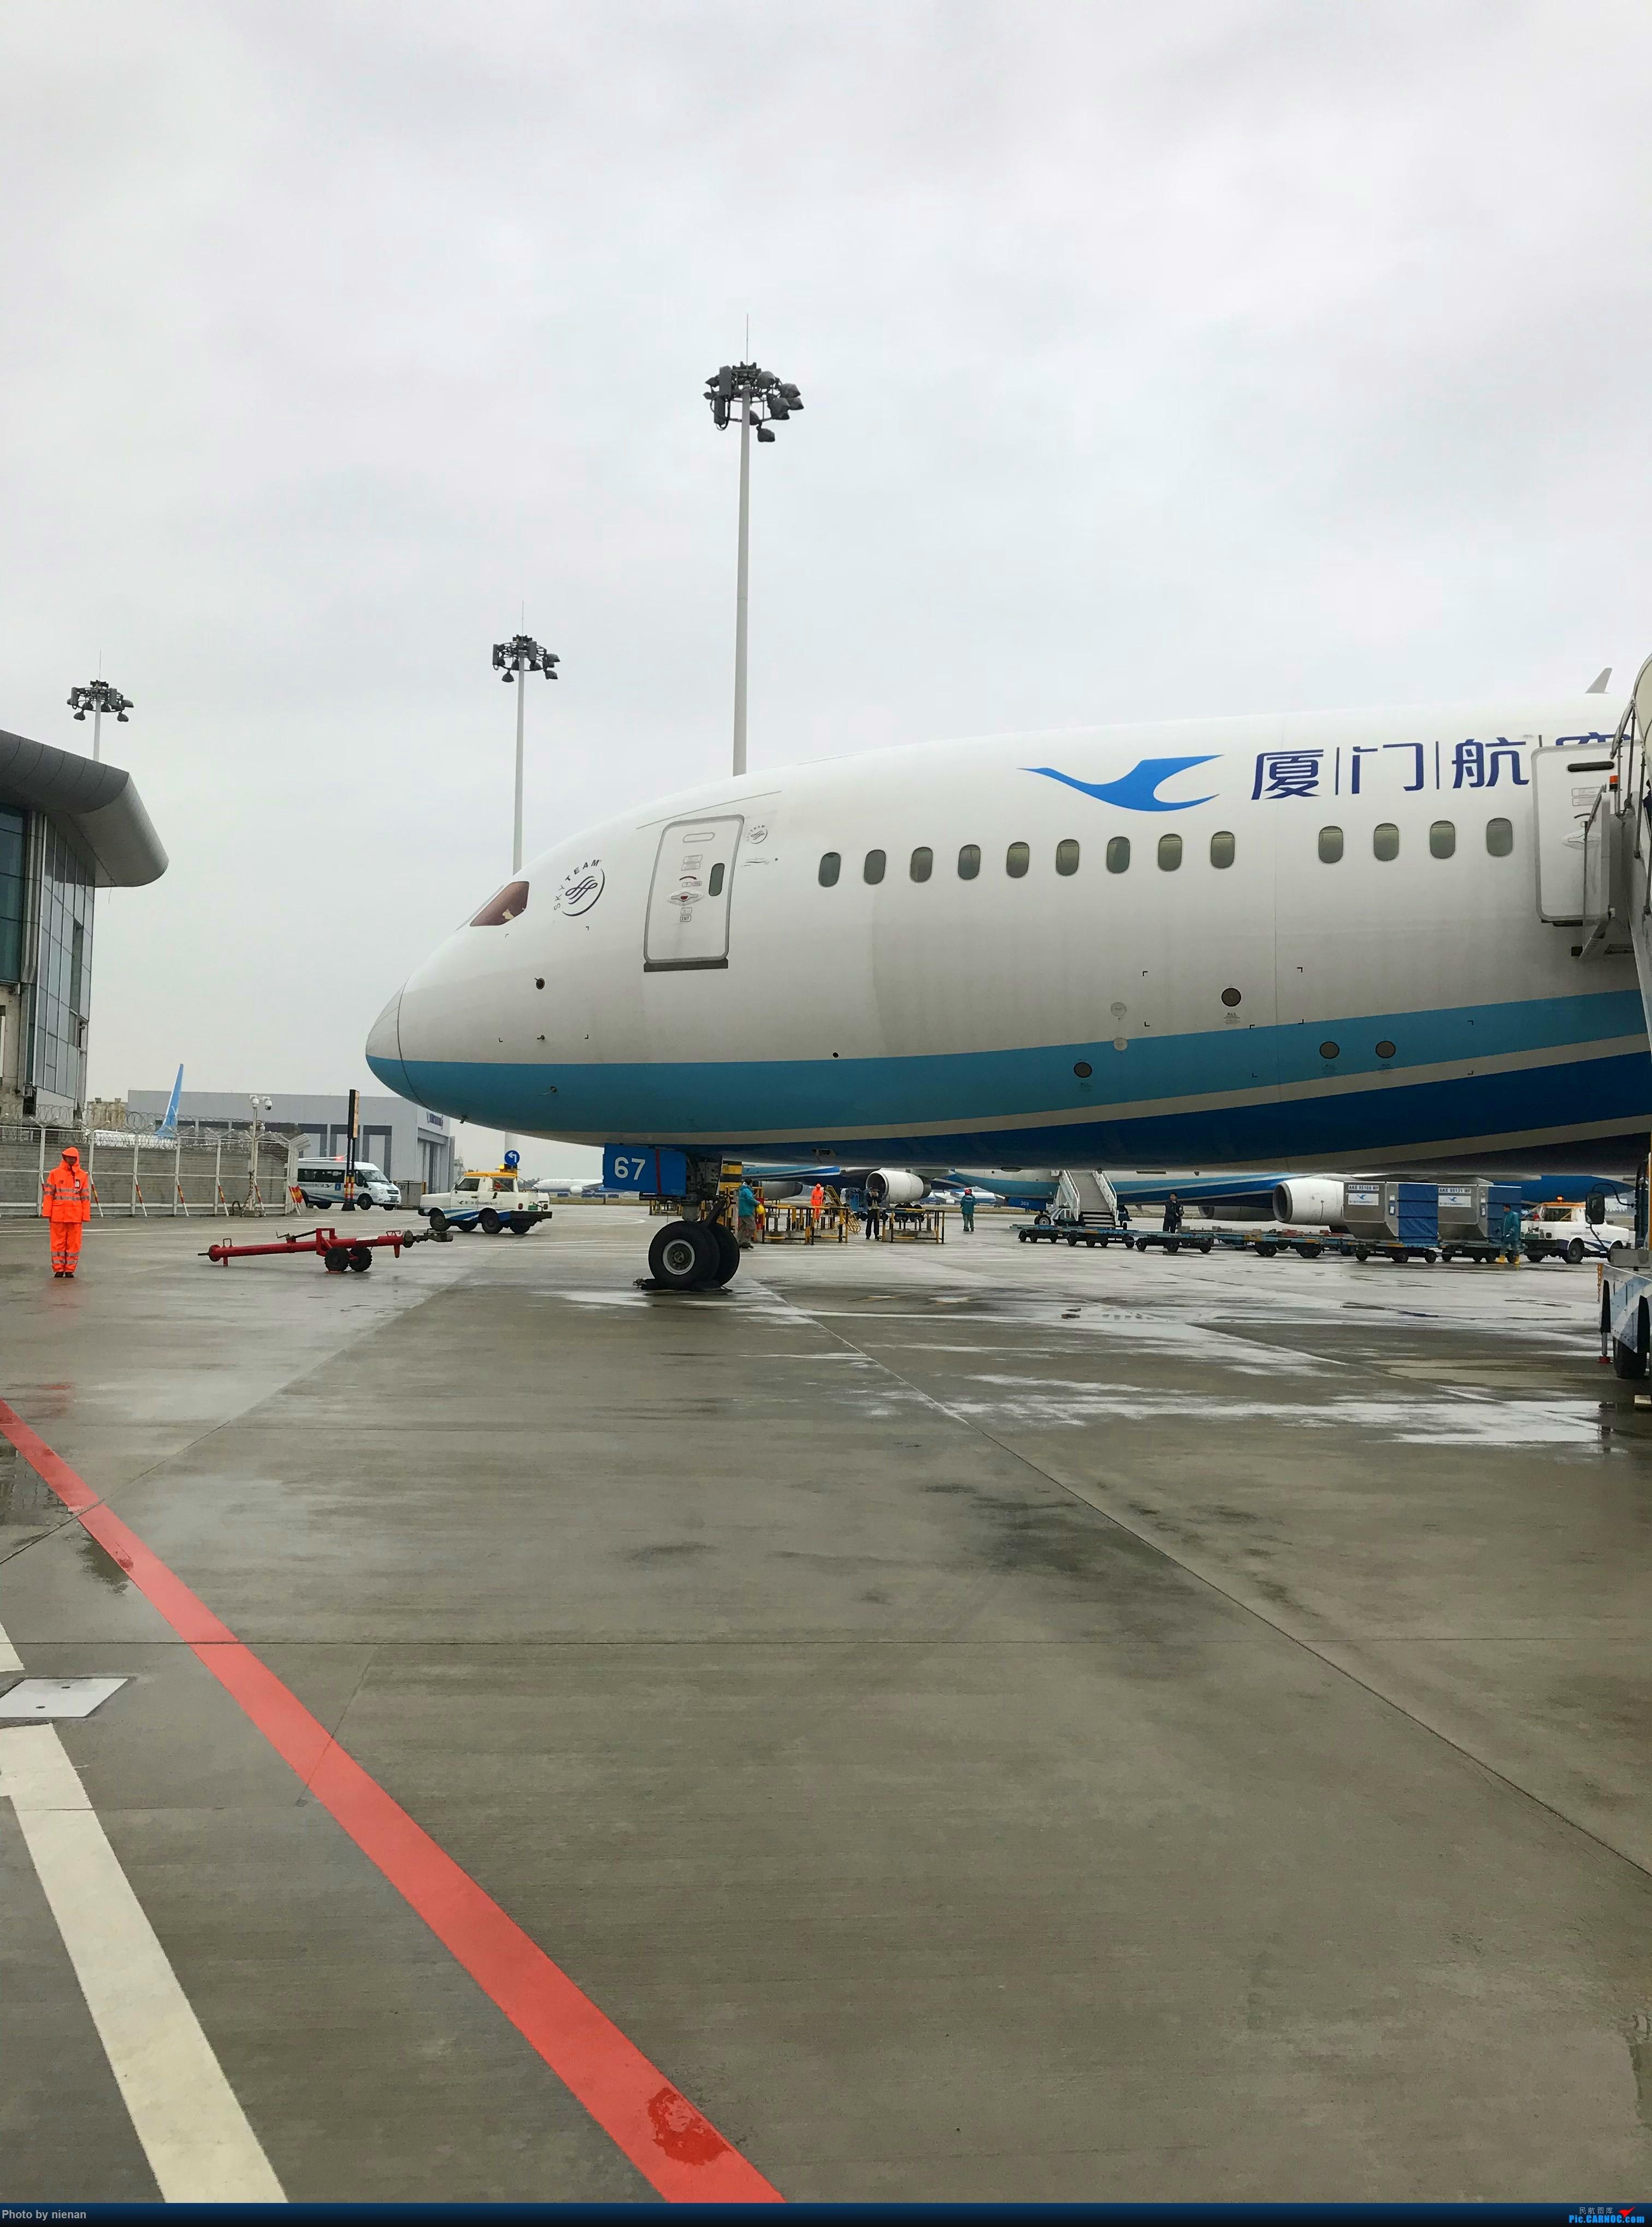 Re:[原创]福州飞友会 MF8115福州到北京787-9公务舱游记